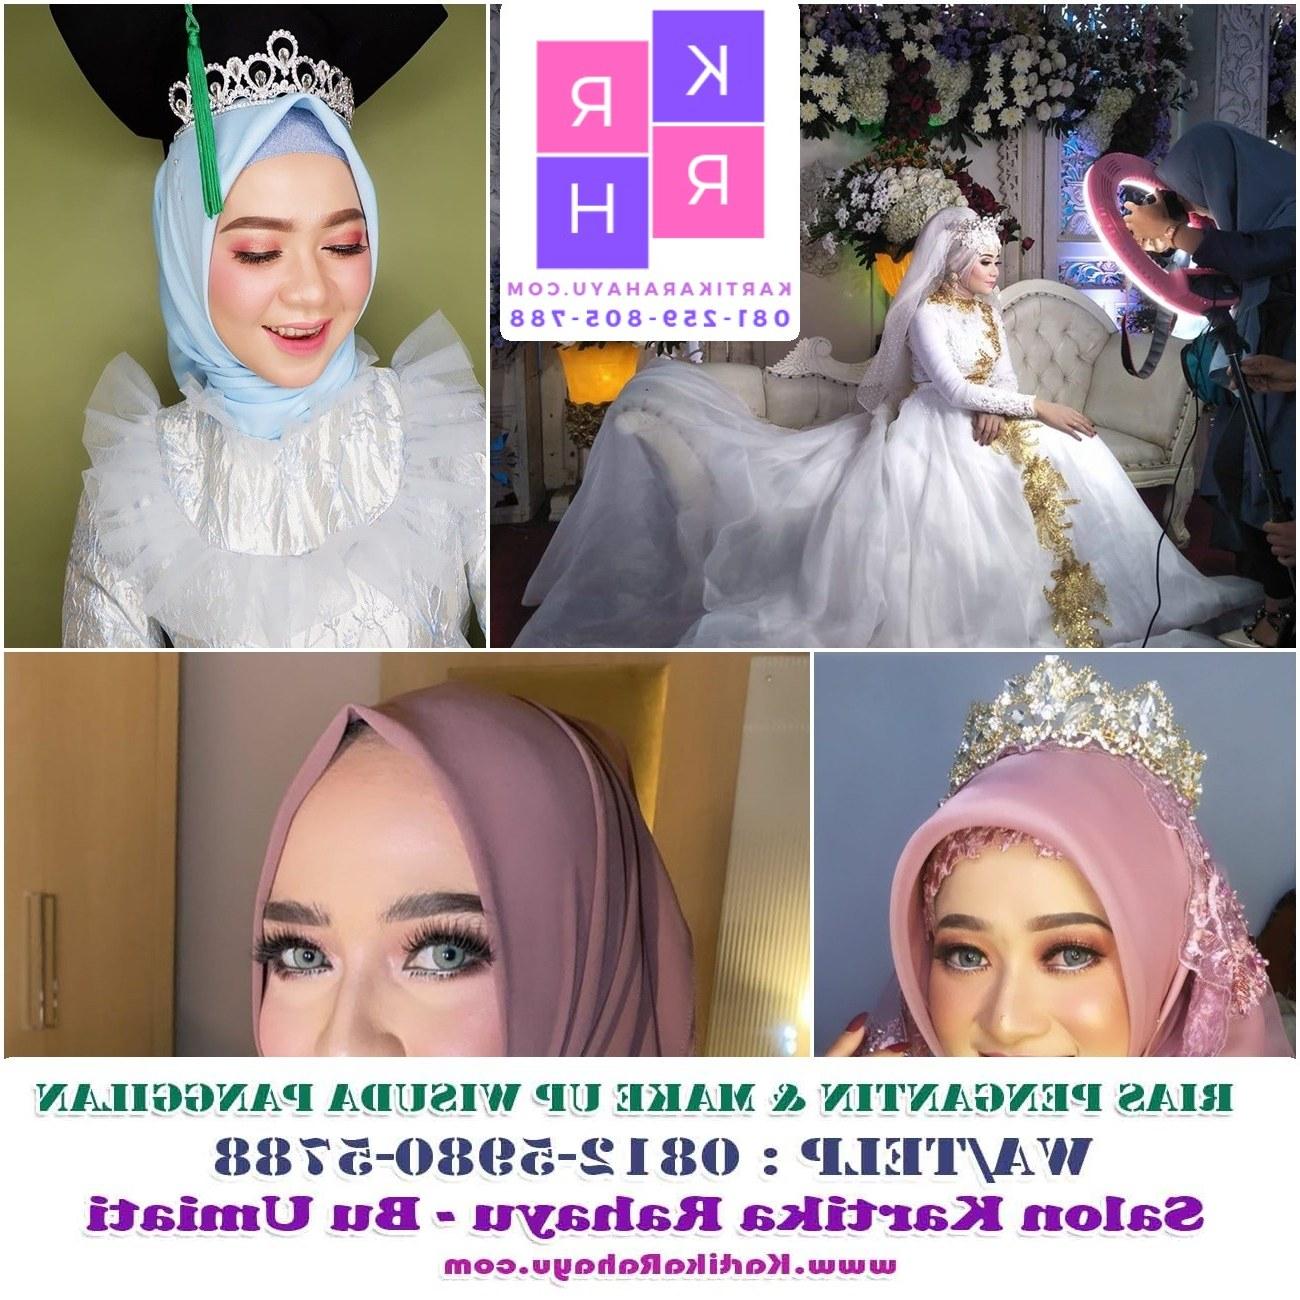 Ide Sewa Gaun Pengantin Muslimah Malang Qwdq Wedding Package Malang Terbaik